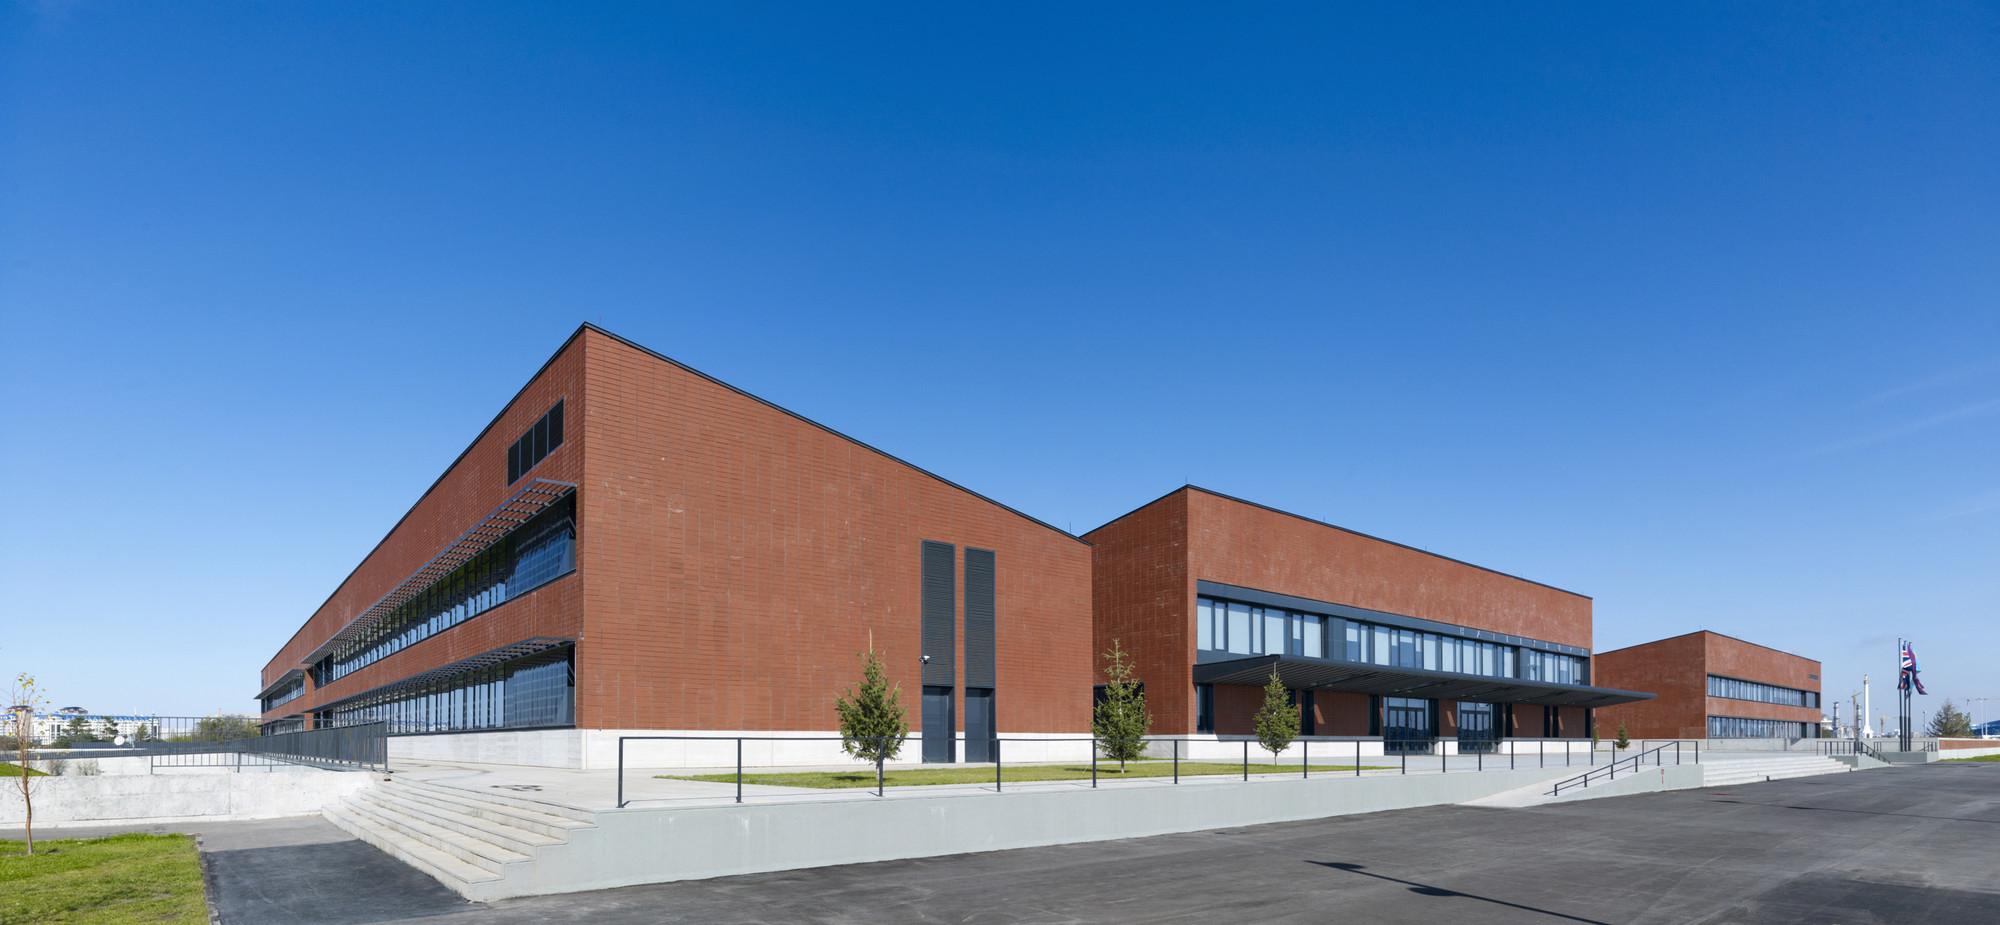 Haileybury Astana School / Cinici Architects, © Cemal Emden